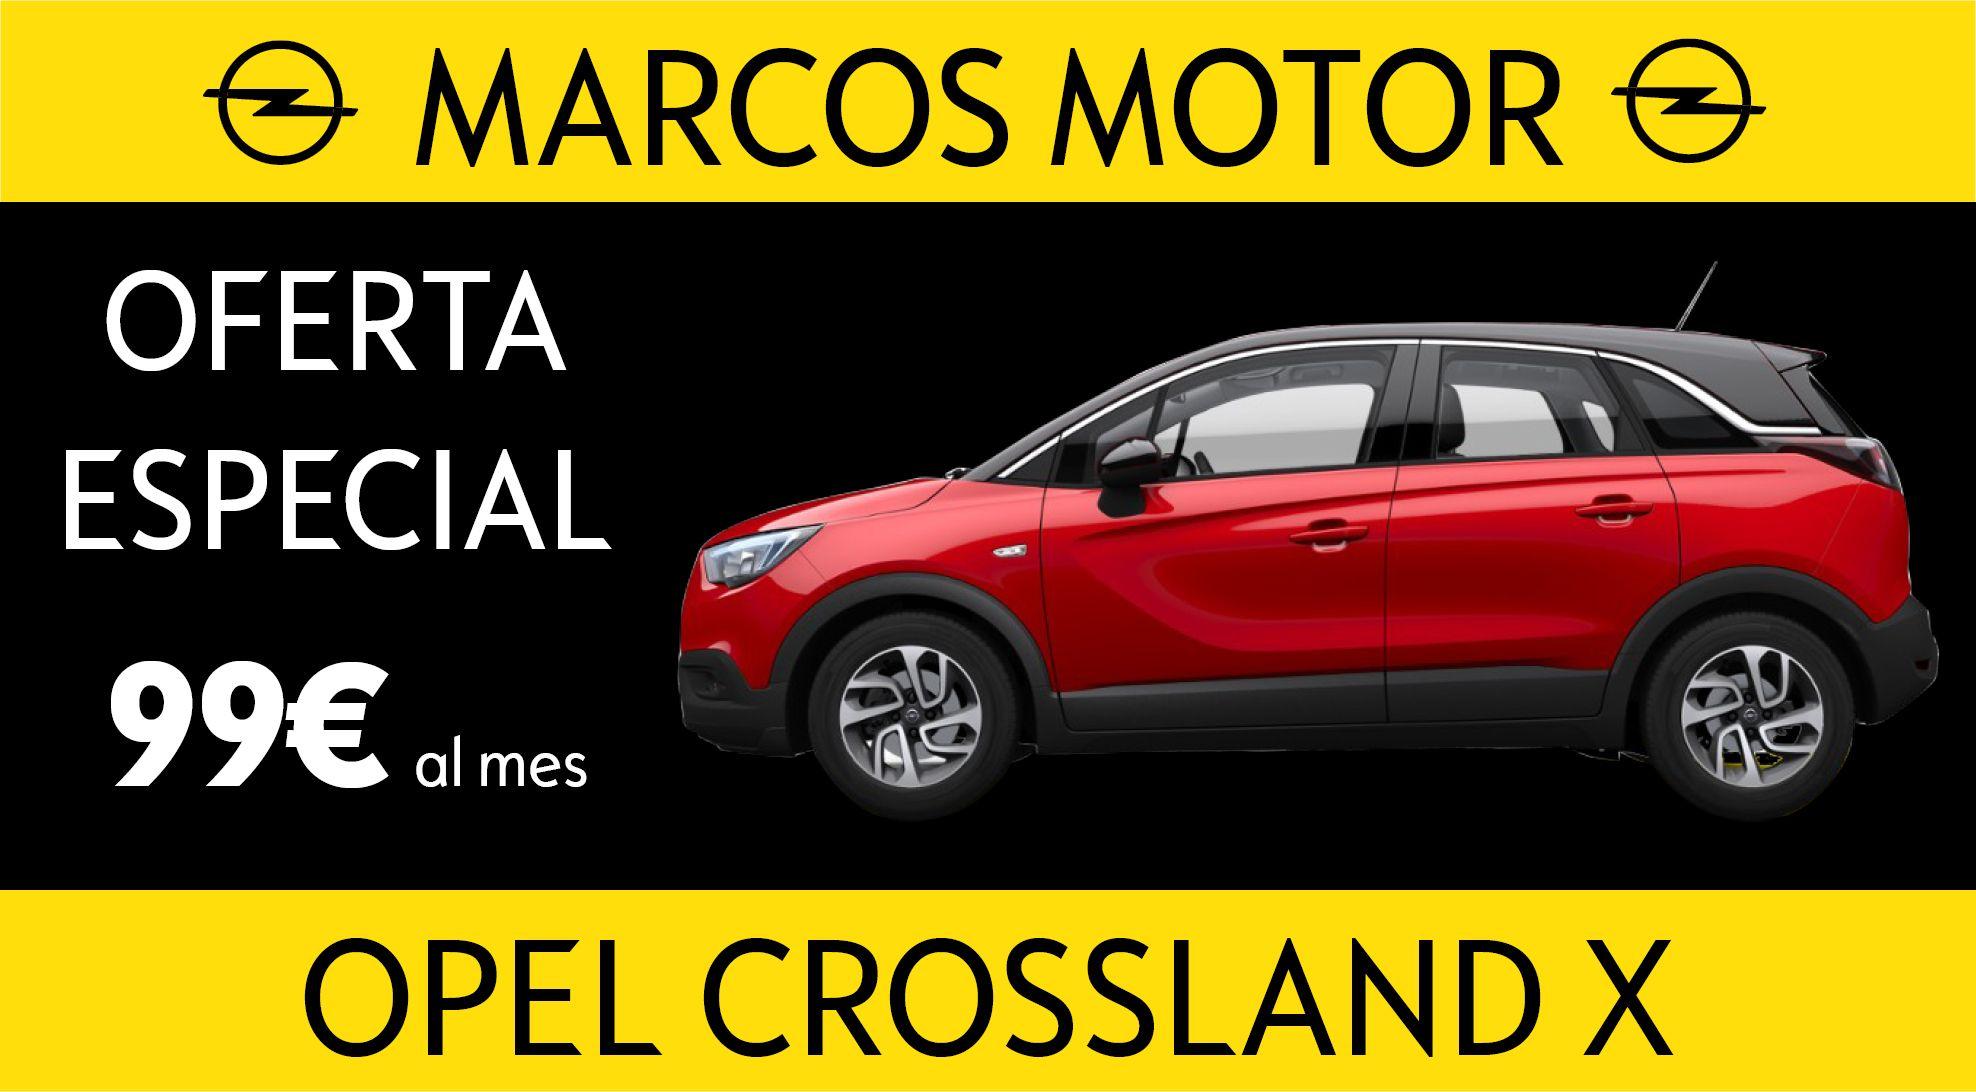 Opel Crossland X Offer € 99 per month